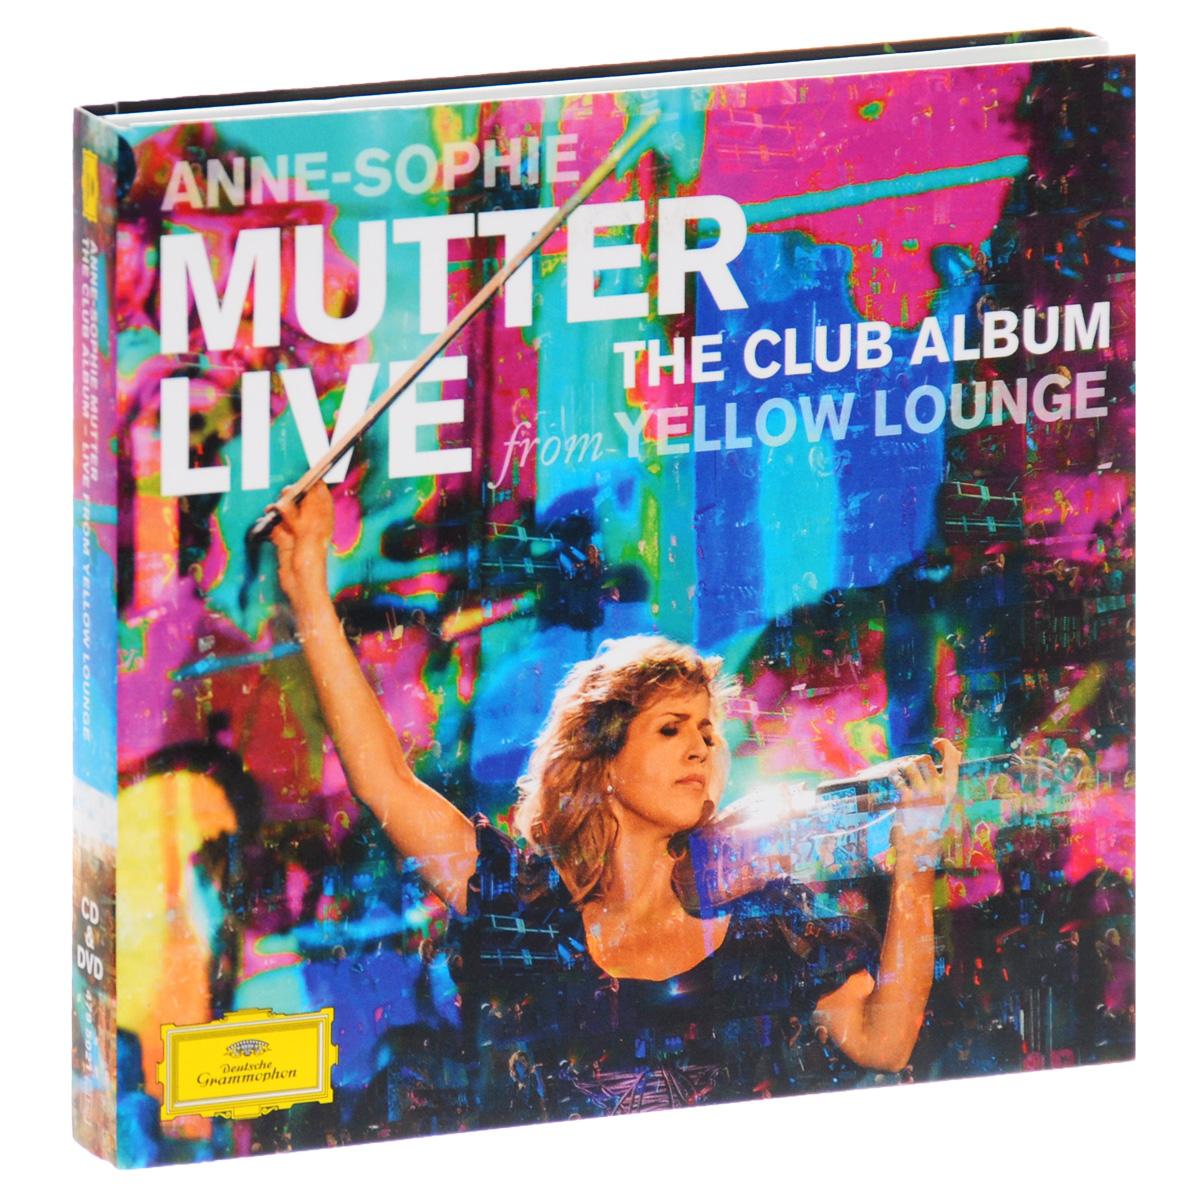 Анна-Софи Муттер,Noa Wildschut,Ламберт Оркис Anne-Sophie Mutter. Live From Yellow Lounge (CD + DVD) confident german cd